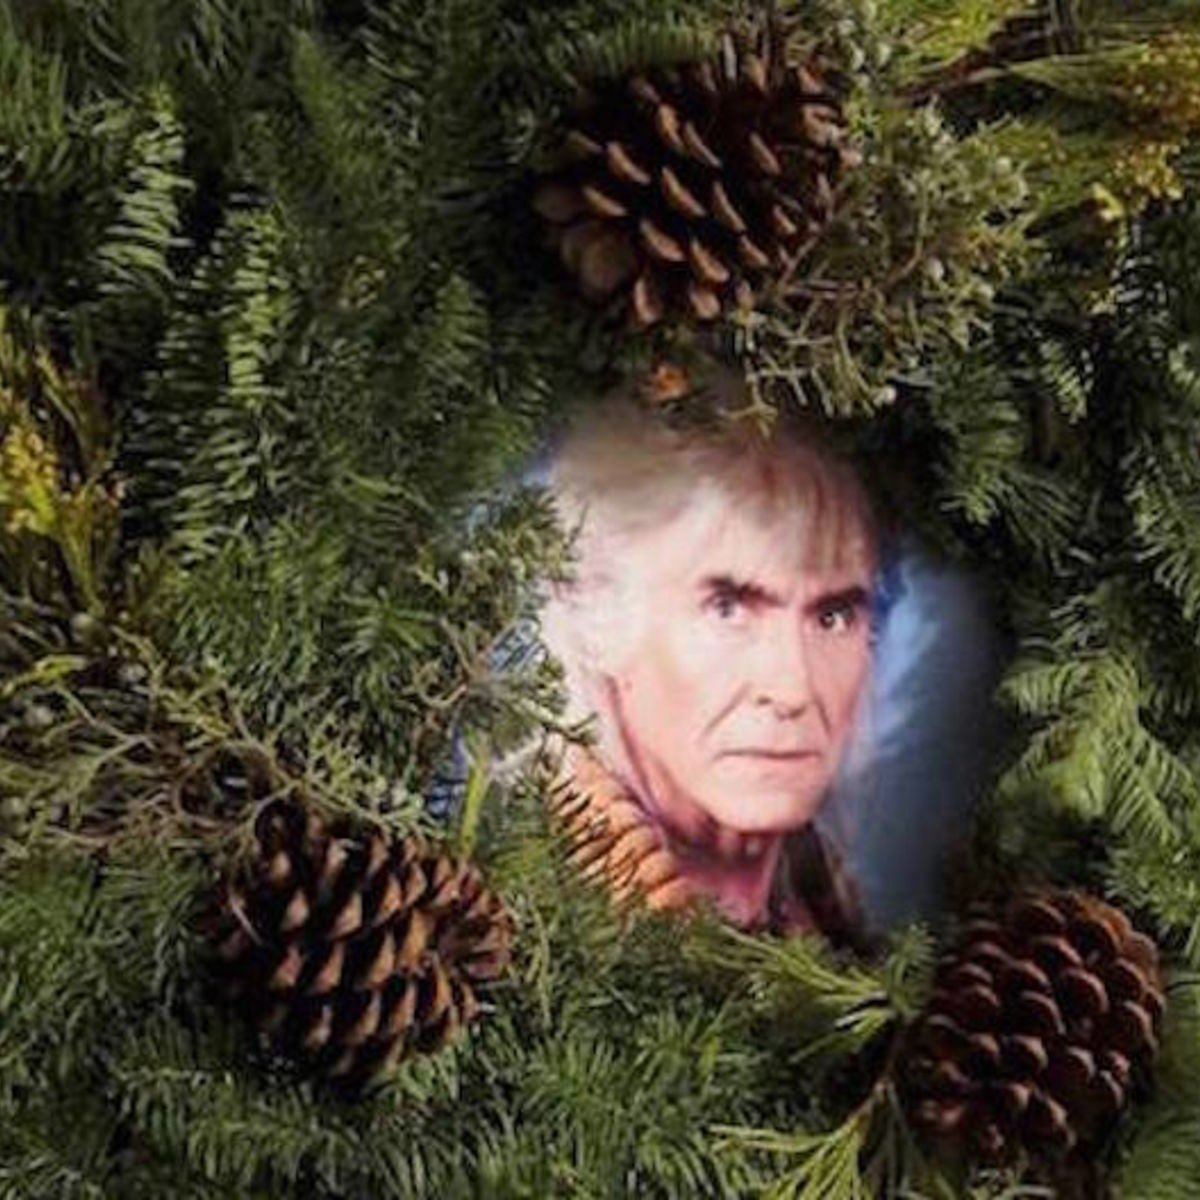 wreath-of-khan-1.jpg